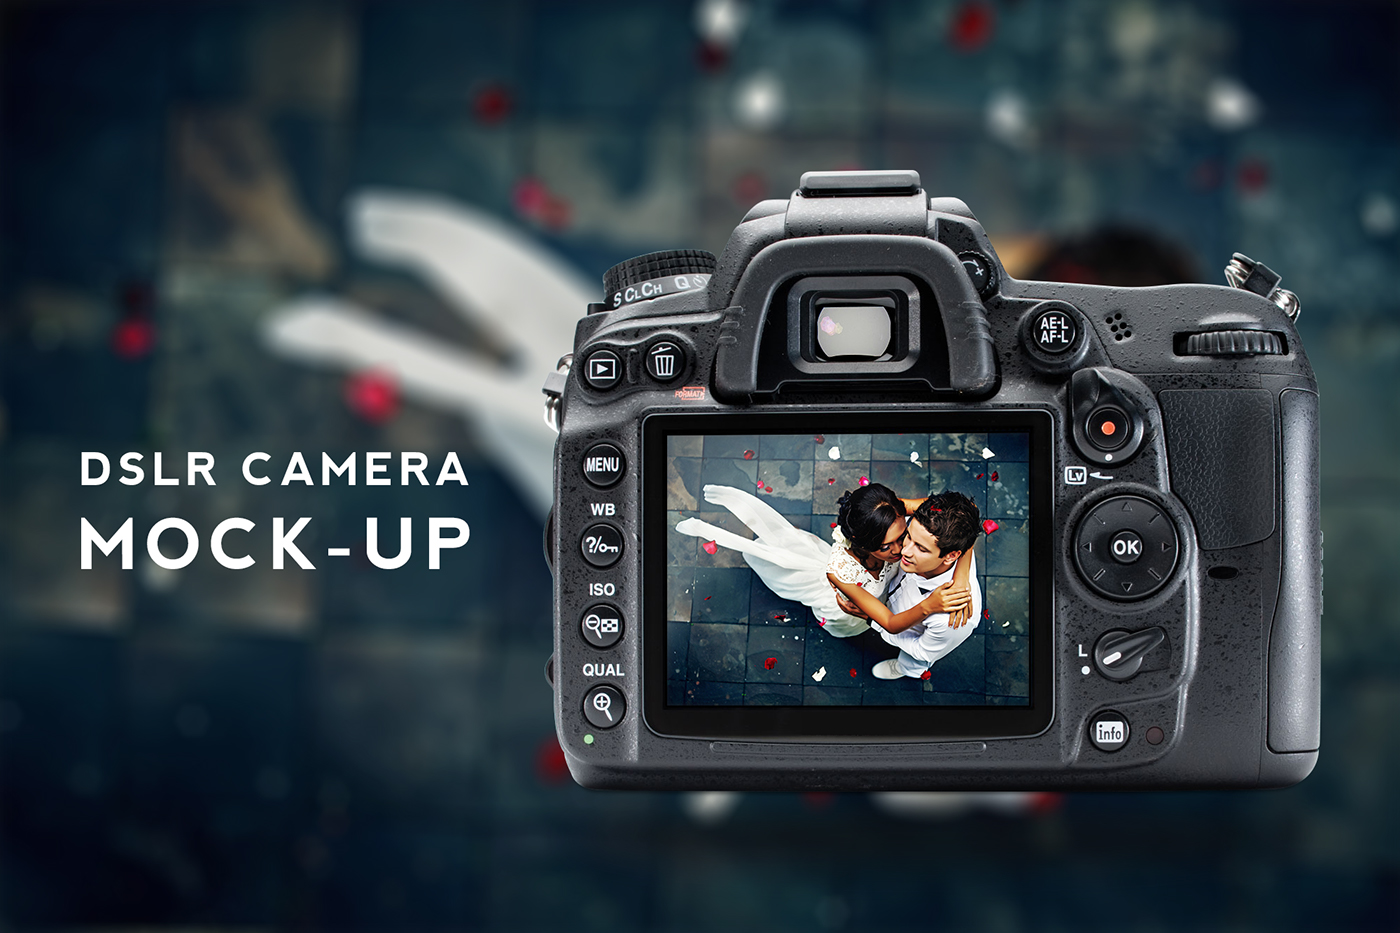 Free Dslr Camera Mockup Psd On Behance